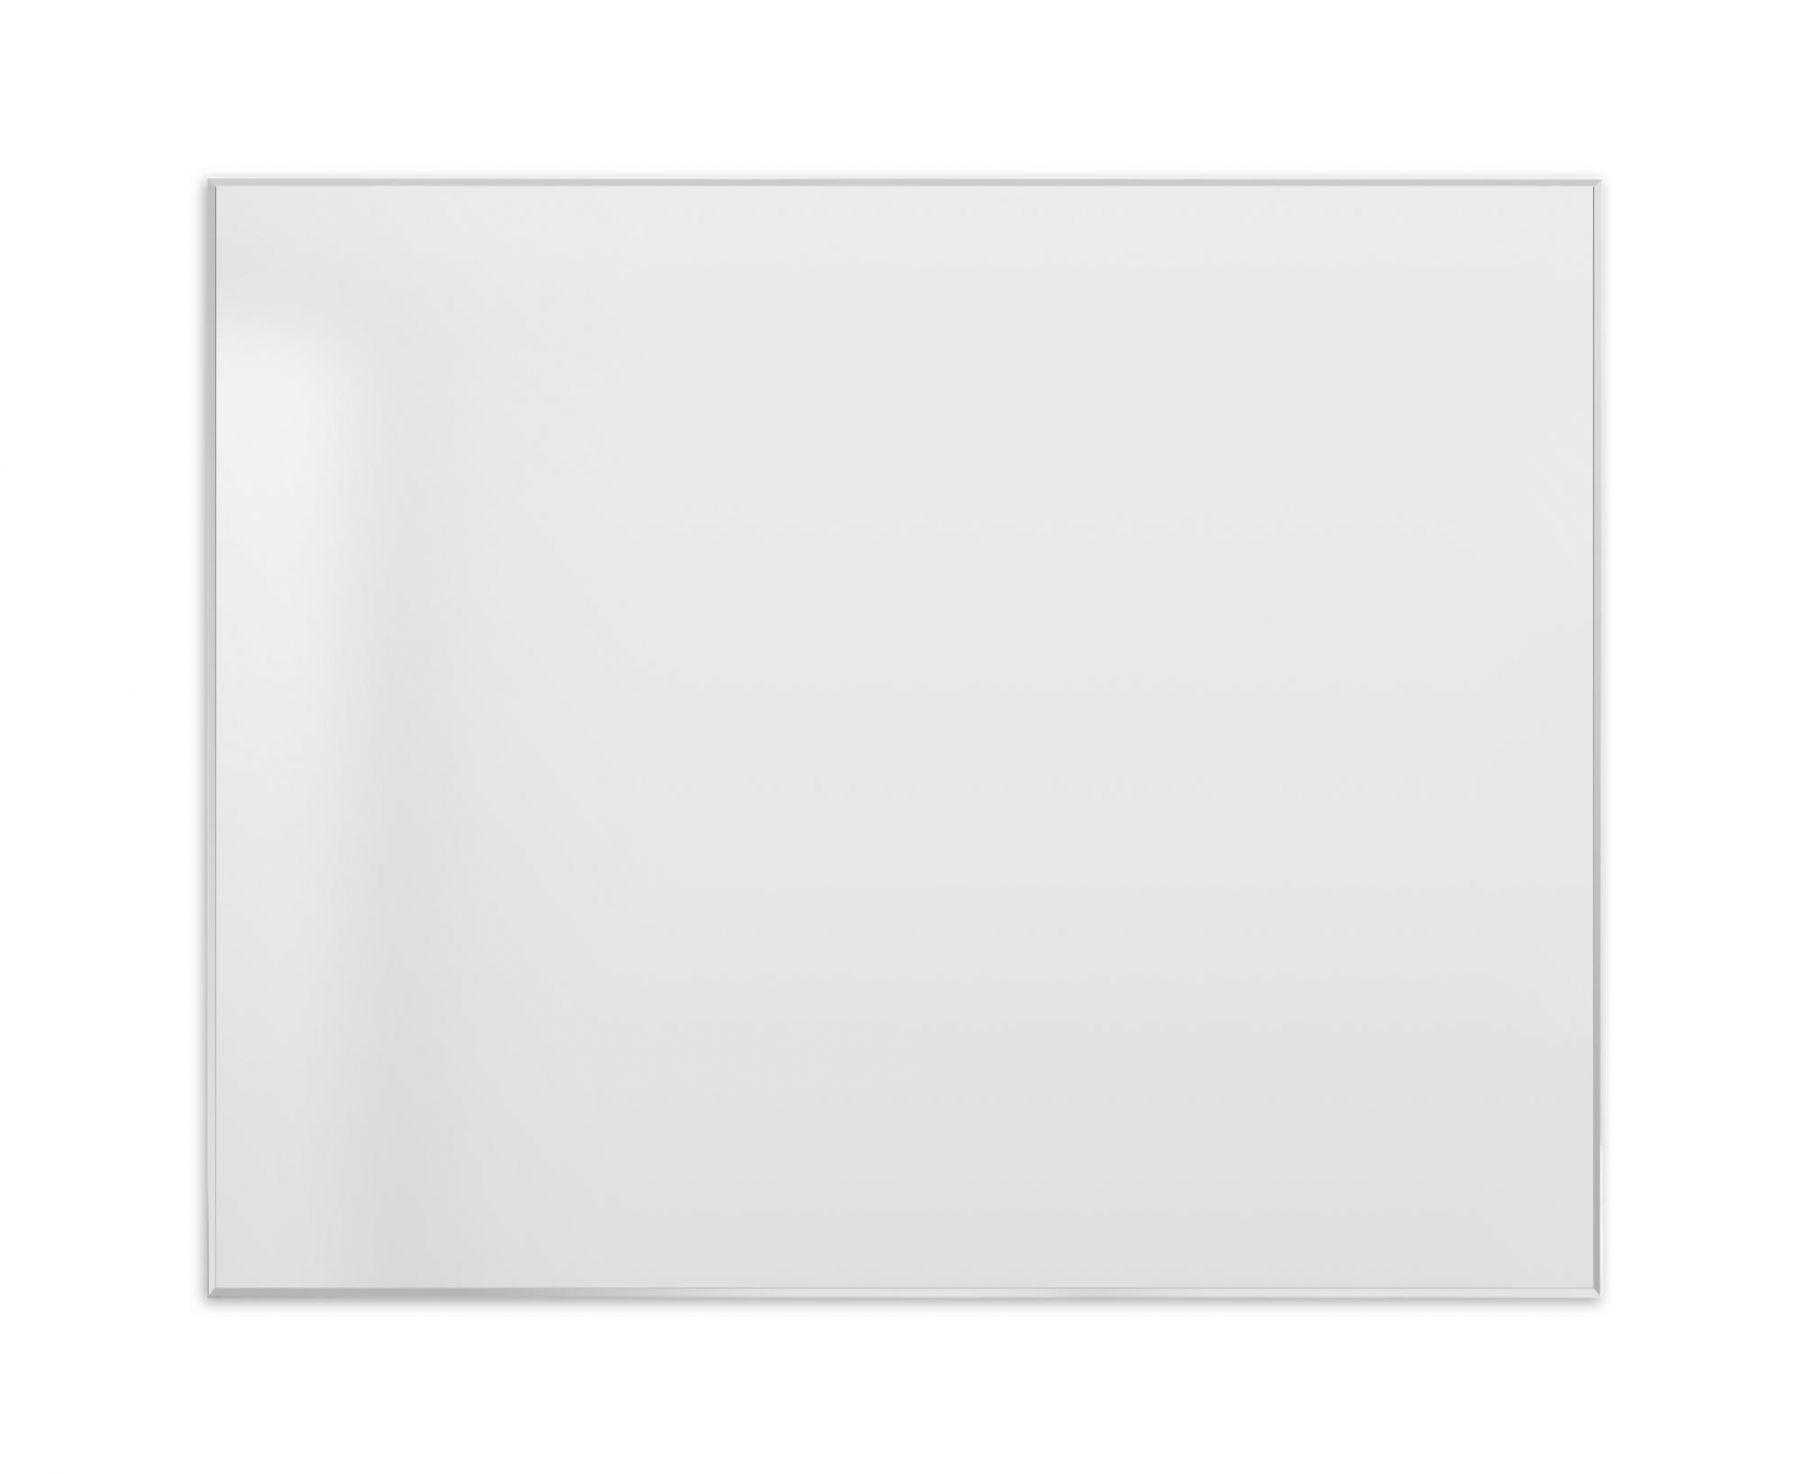 Зеркало для ванной комнаты BelBagno SPC-AL-1000-800 ФОТО